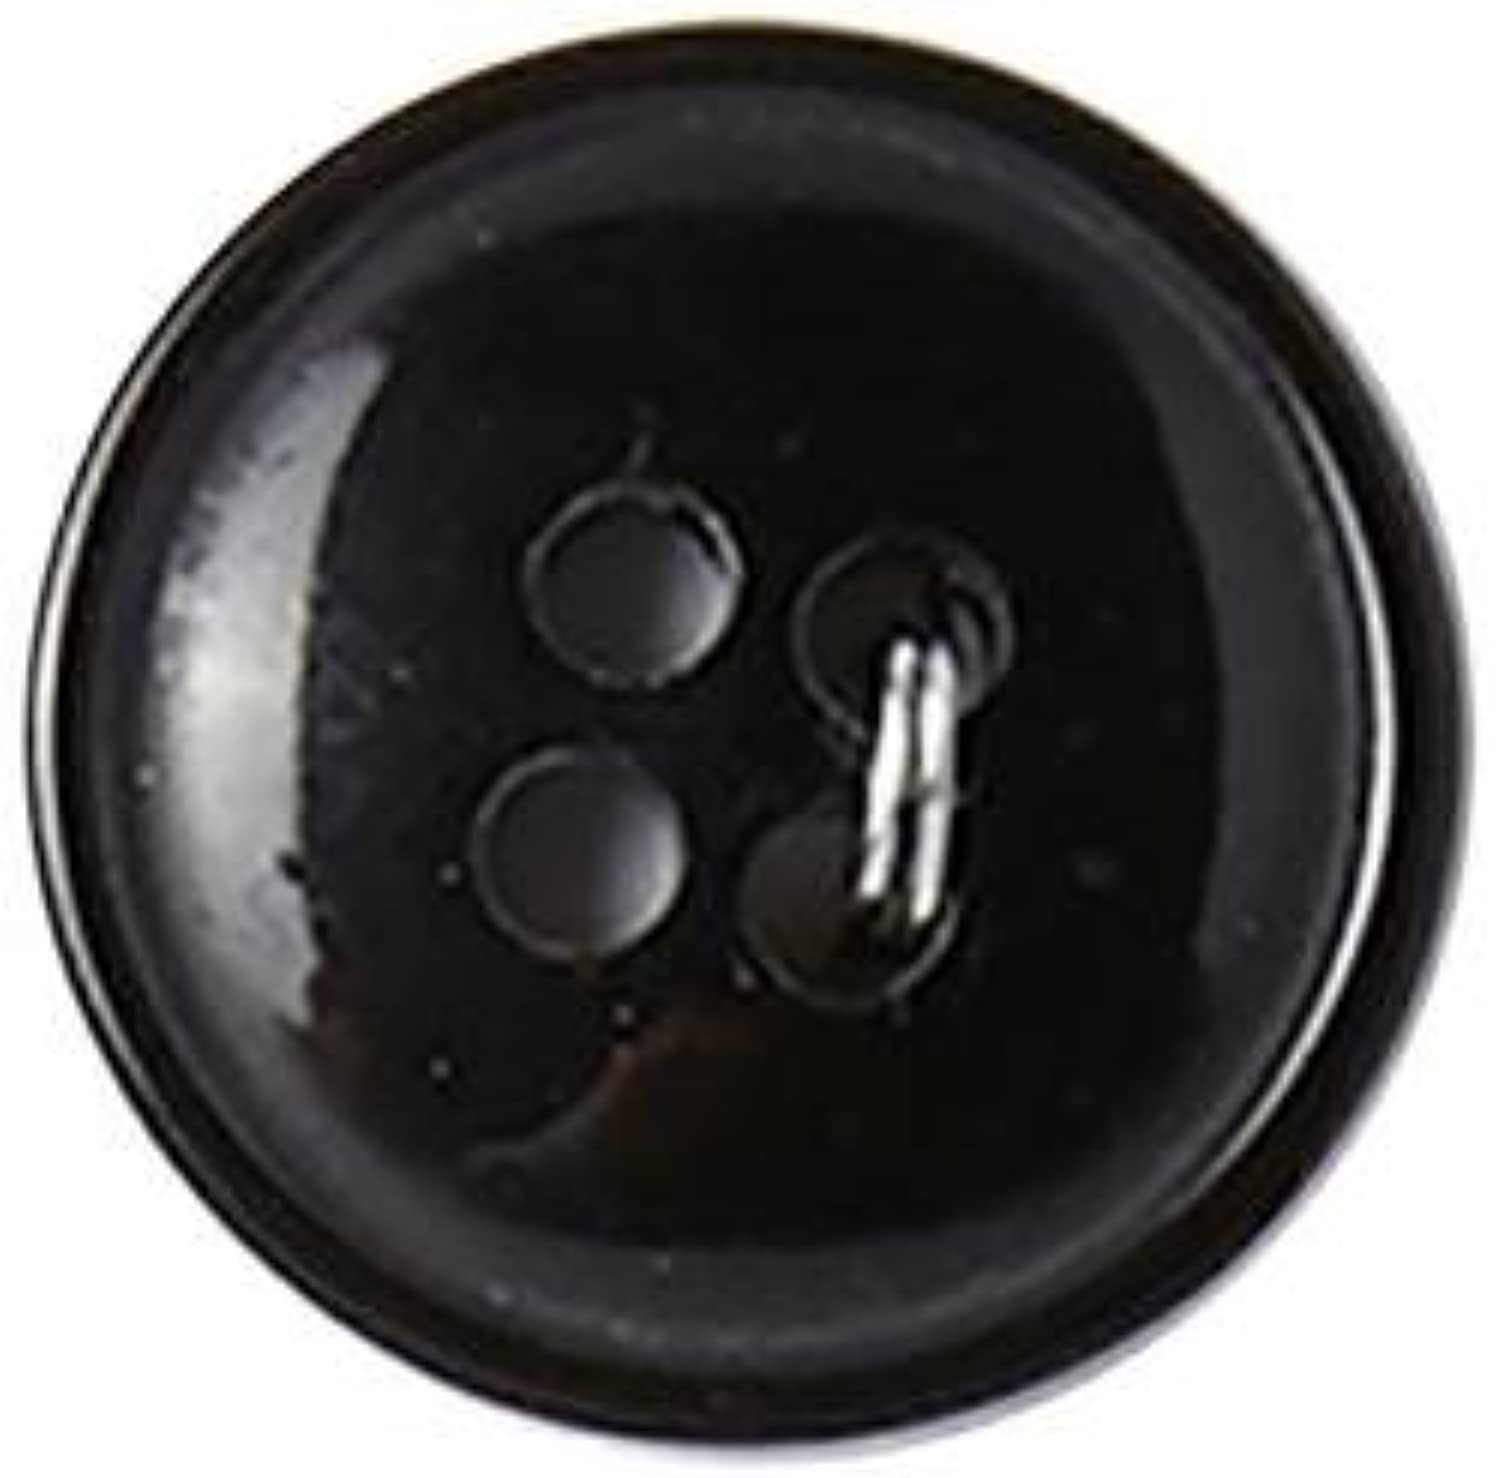 Bulk Buy: Blumenthal Lansing Slimline Buttons Series 1-Black 4-Hole 5/8